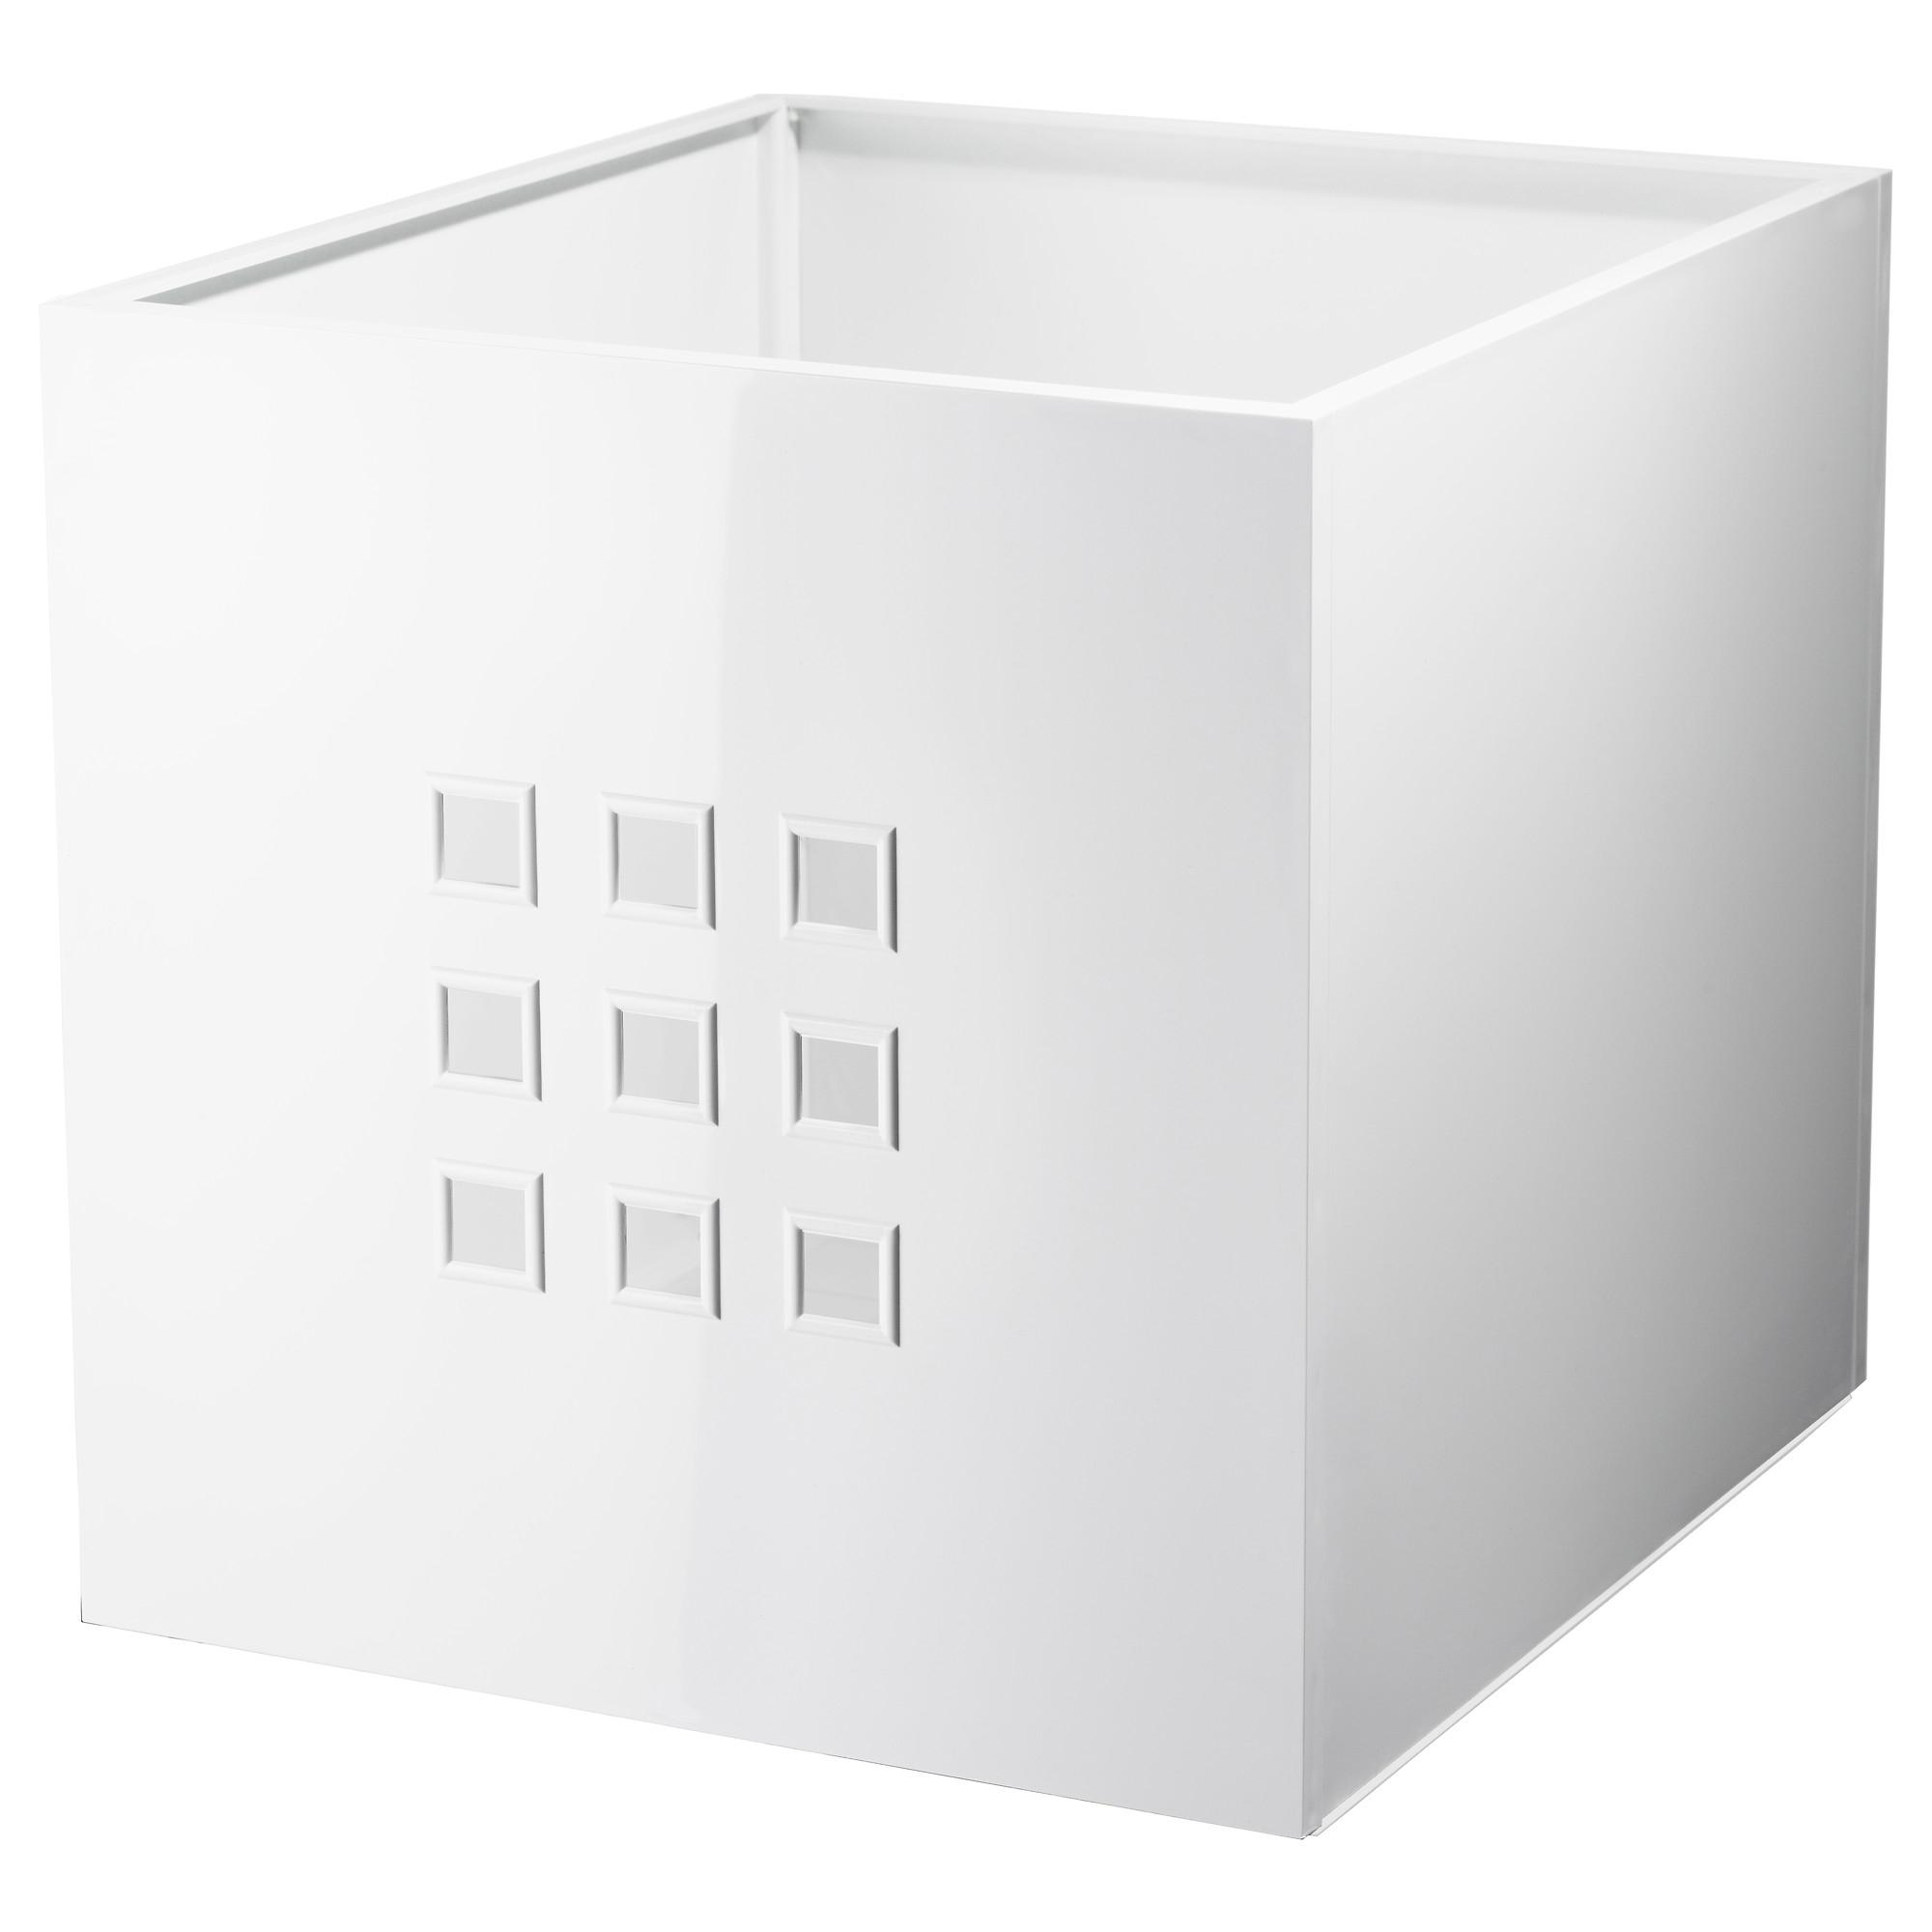 Caja De Plastico Ikea Good Almscenaje Ikea Cajas Kupol With Caja  ~ Cajas Plastico Almacenaje Baratas